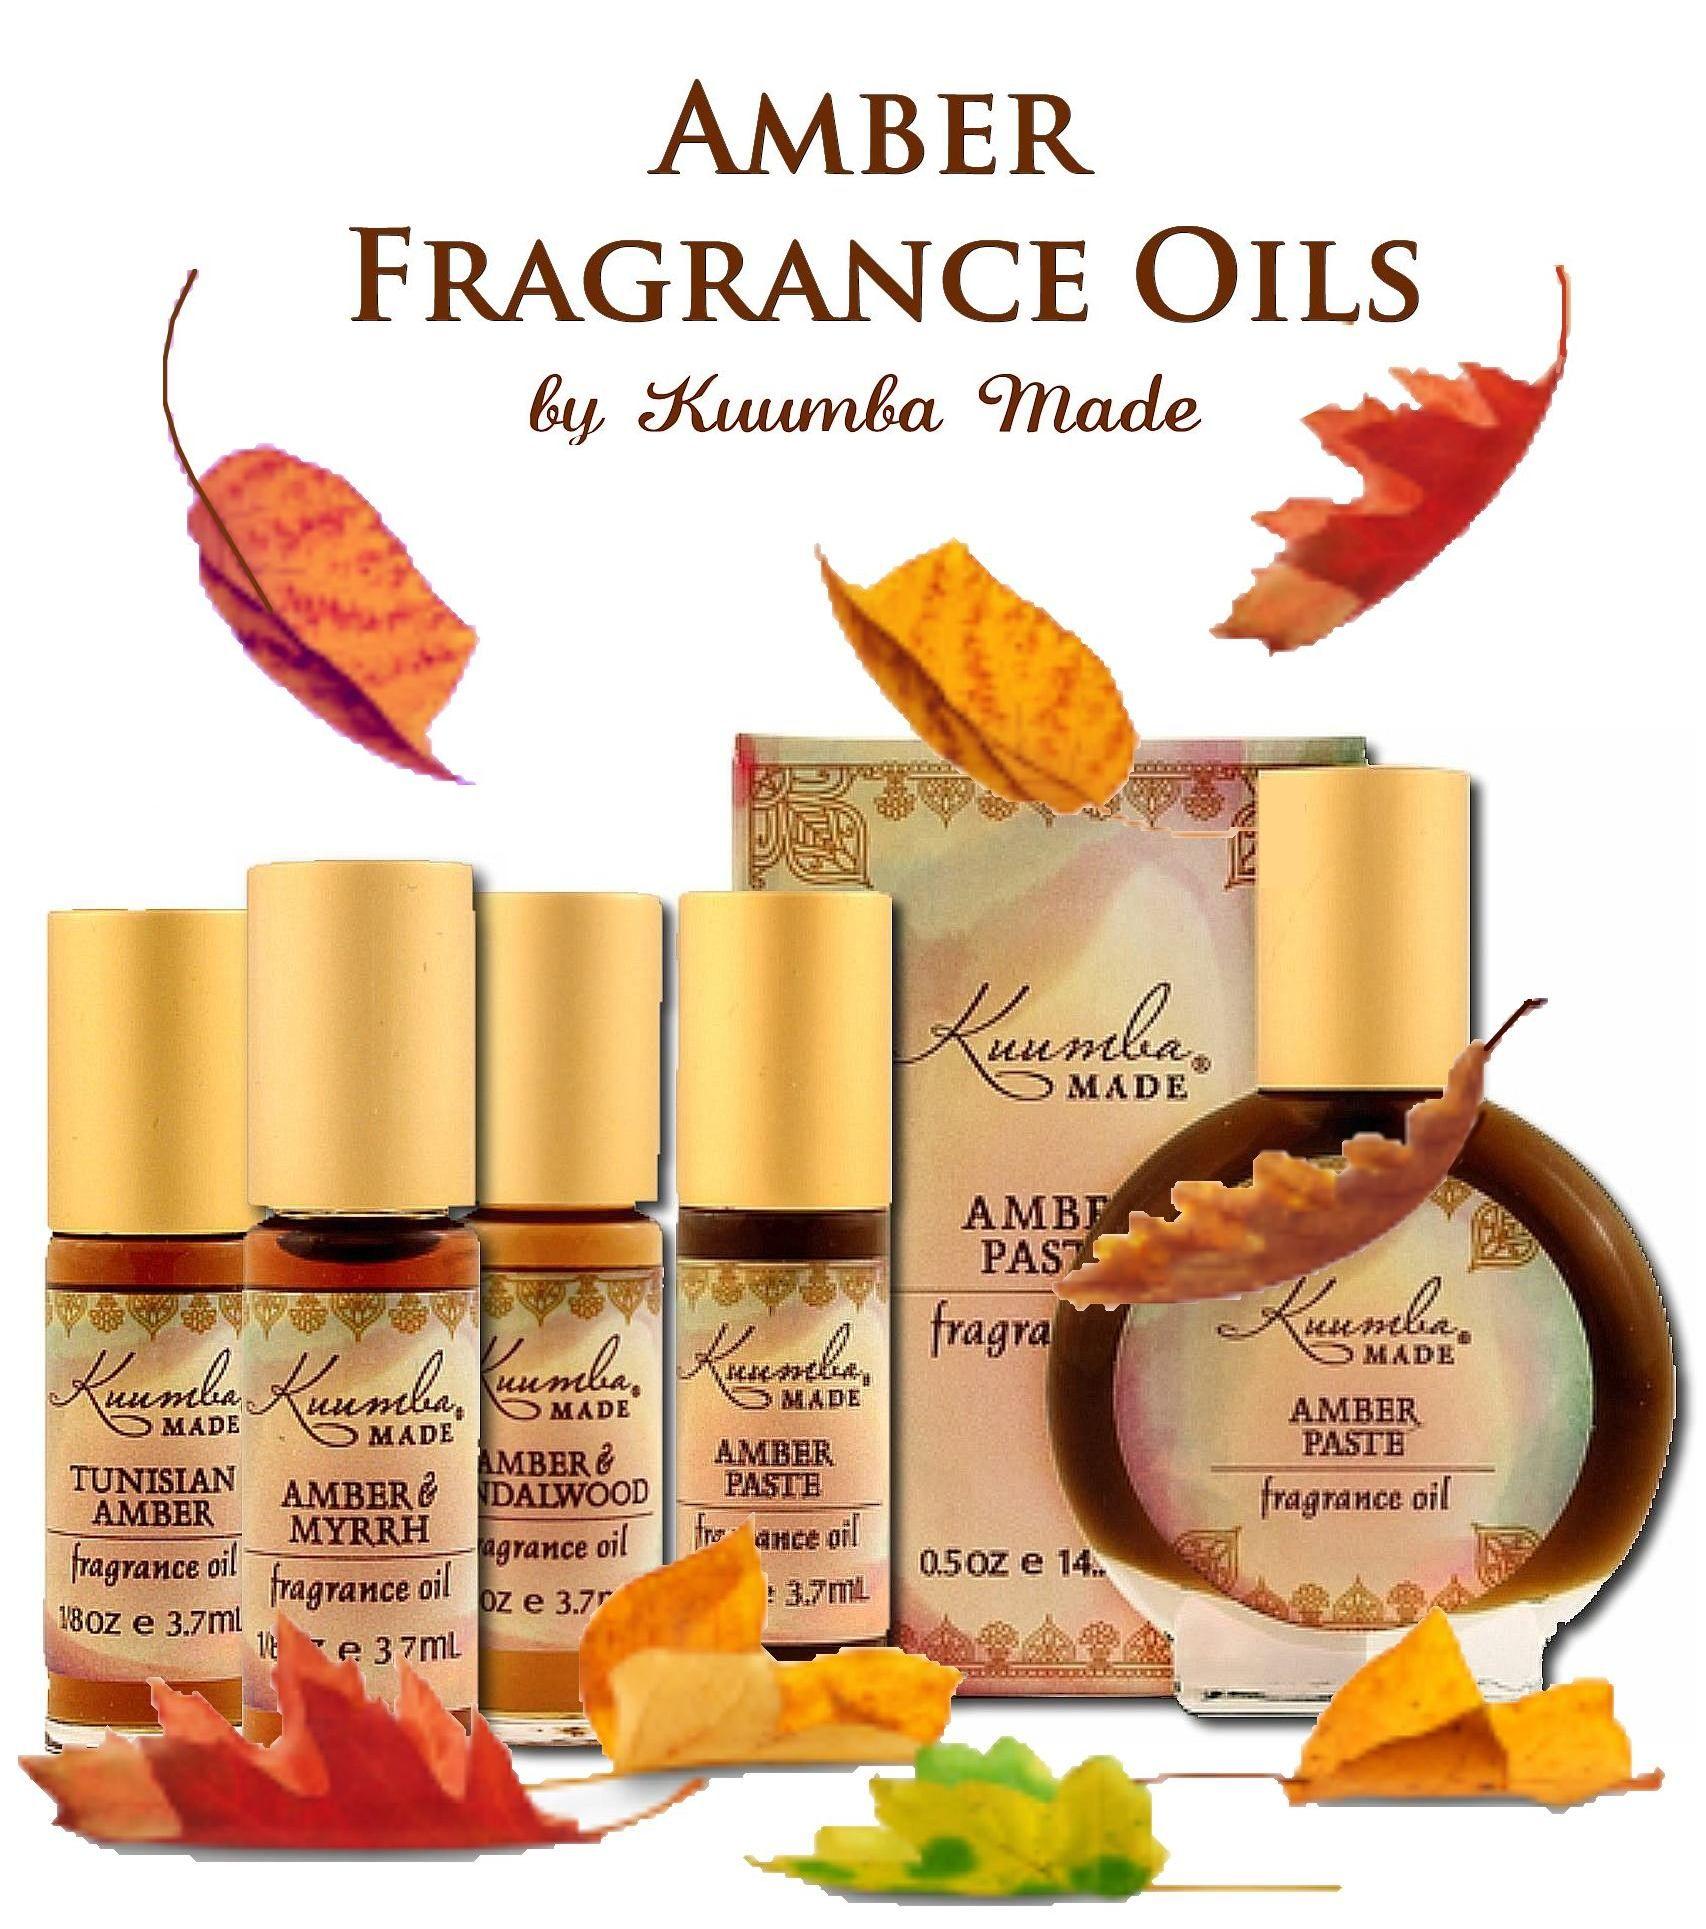 Kuumba Made Fragrance Oils Ambers Fragrance Ingredients Fragrance Oil Fragrance Oil Blends